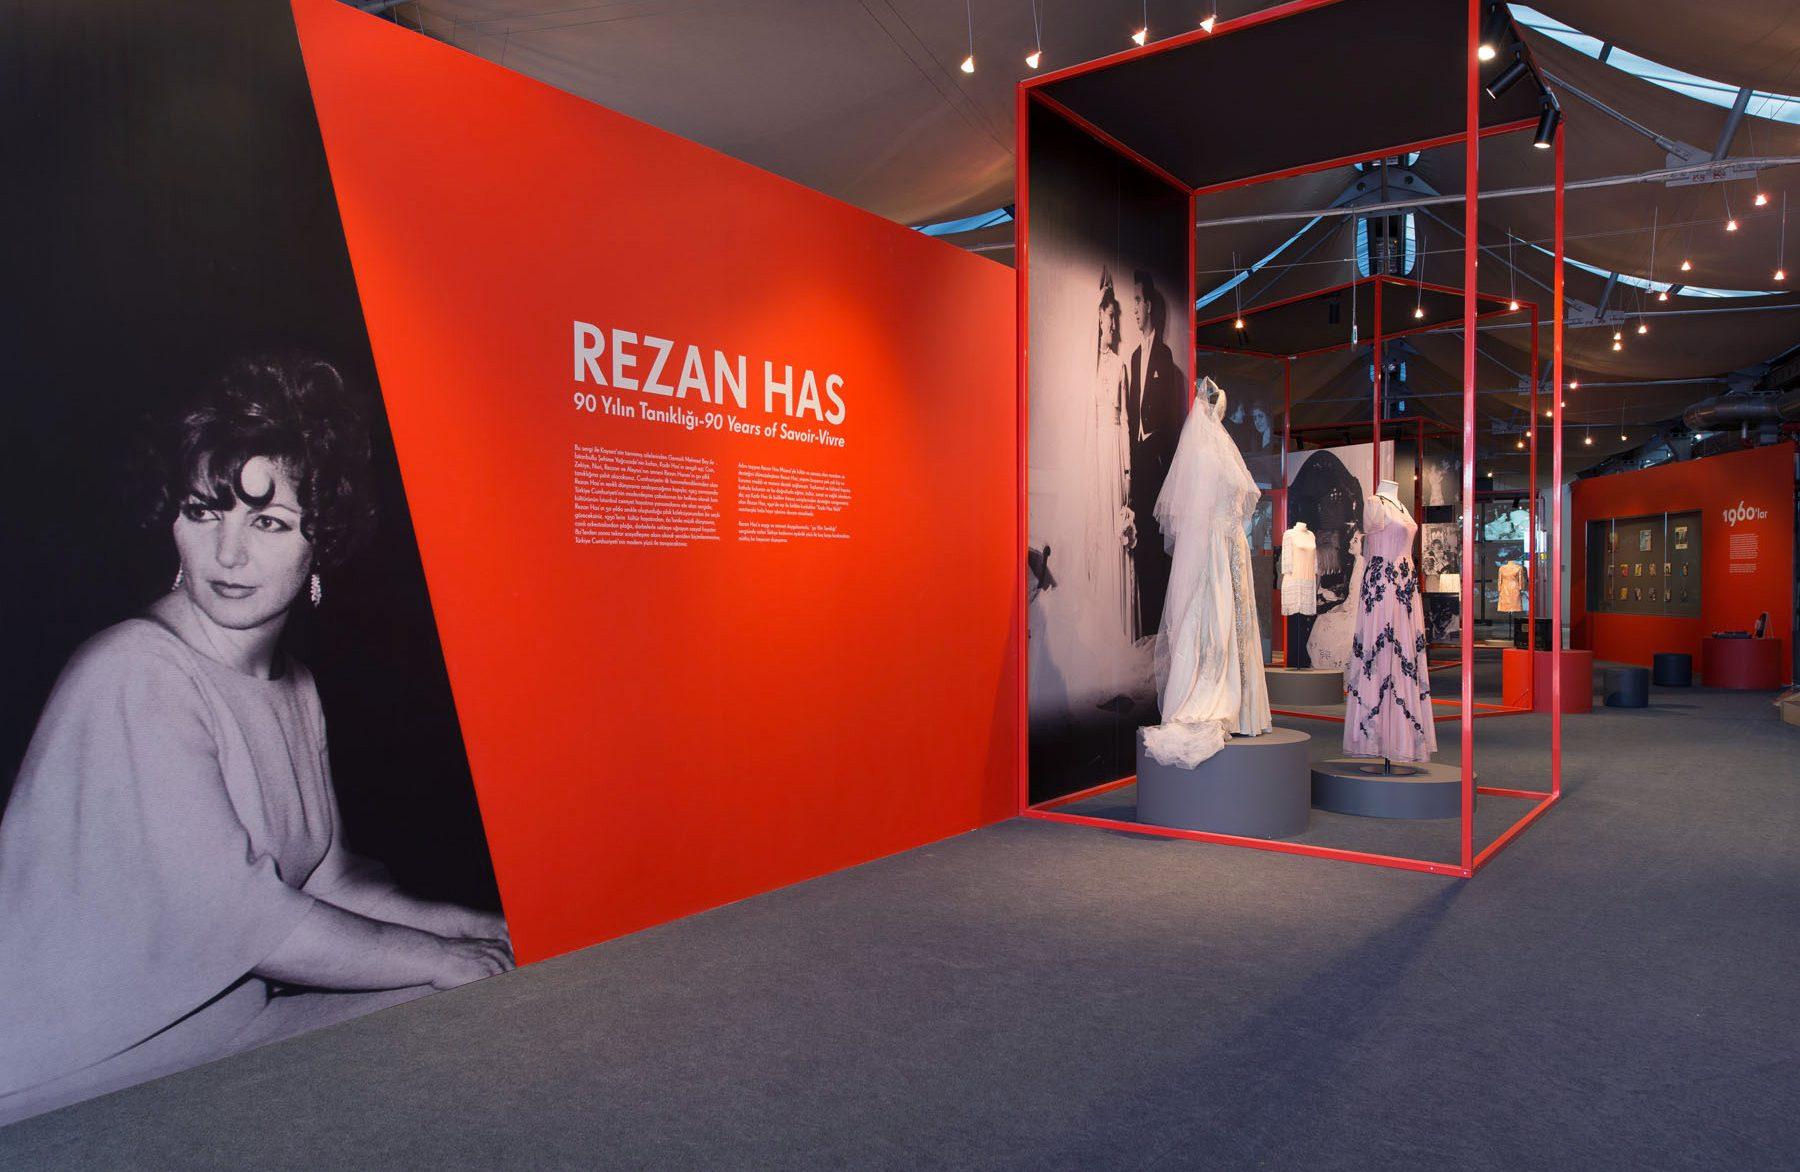 054-REZAN-HAS (17)